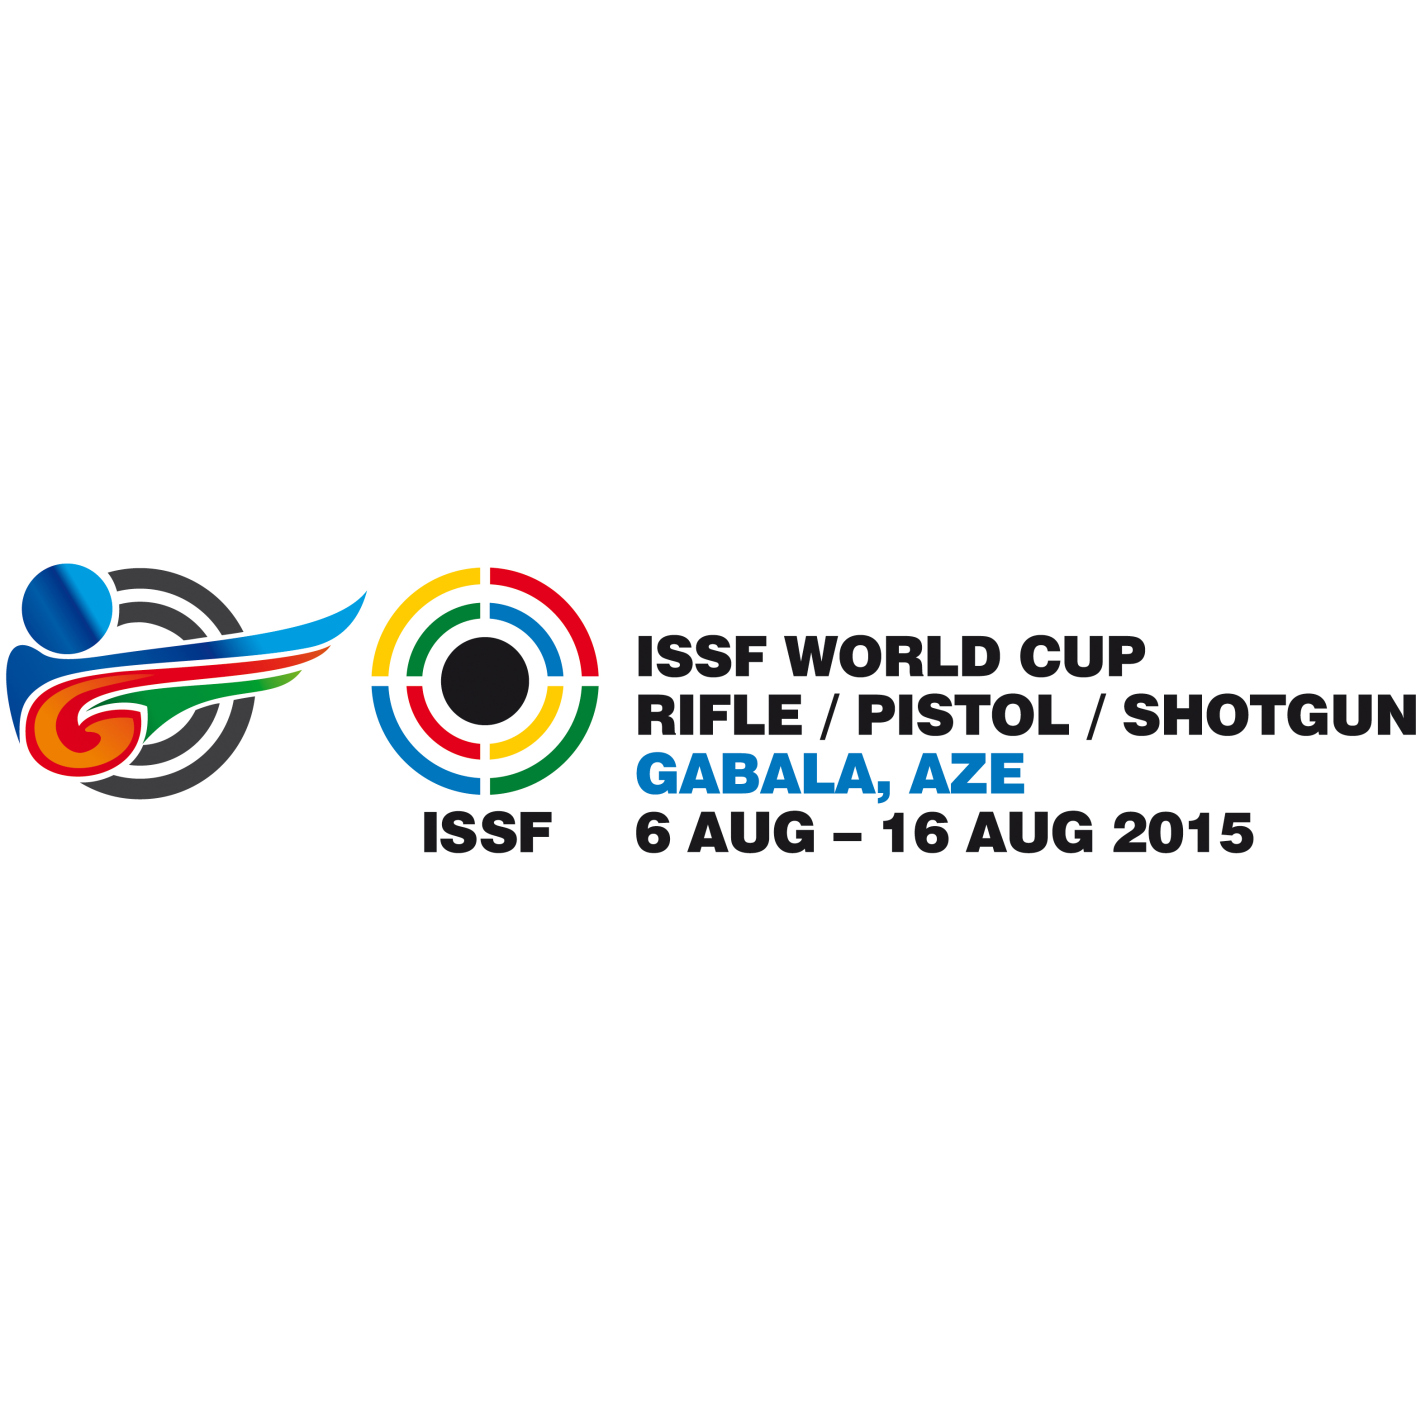 2015 ISSF Shooting World Cup - Rifle / Pistol / Shotgun